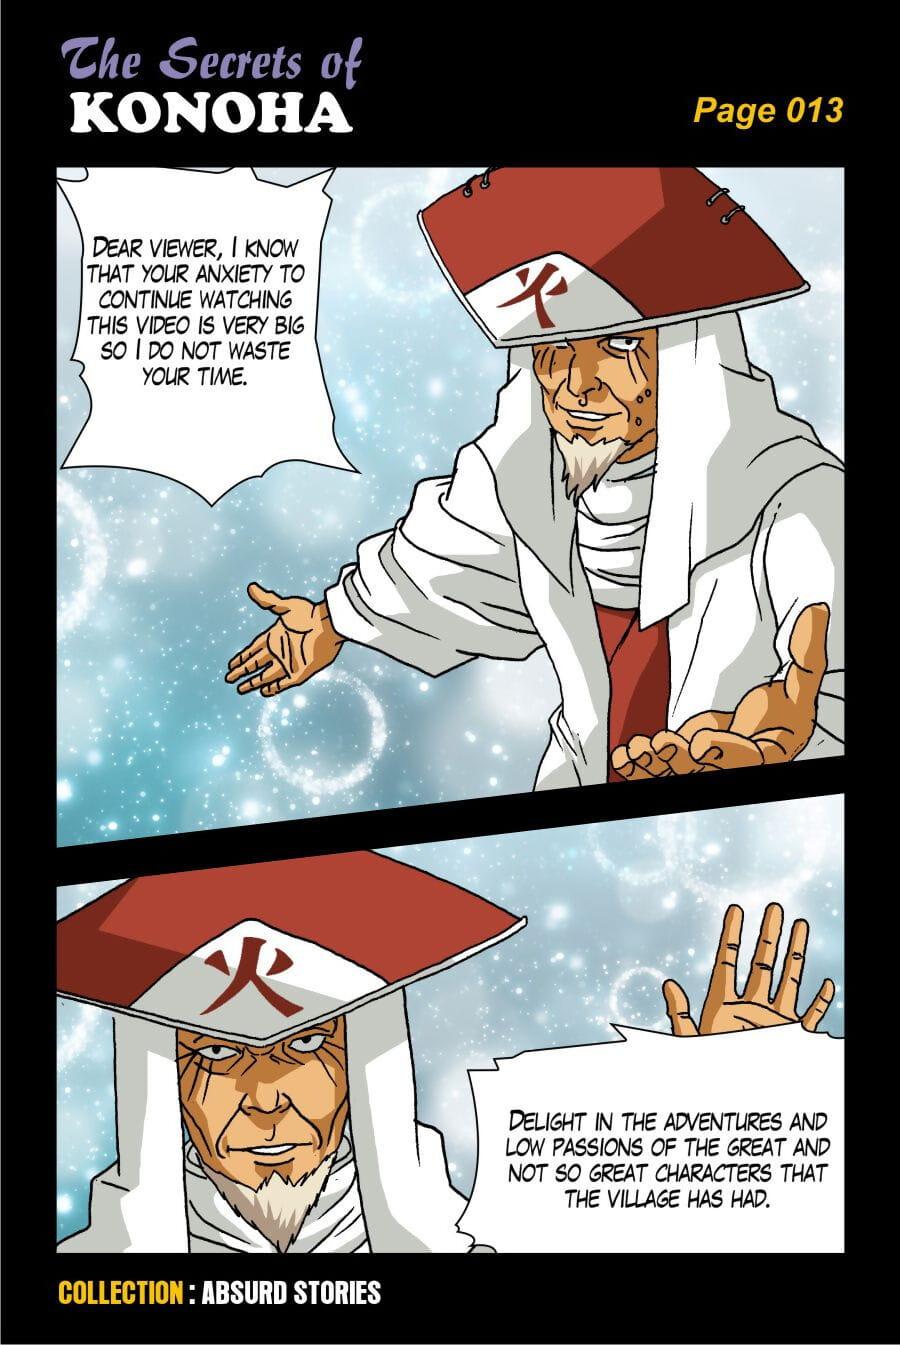 The Secrets of Konoha